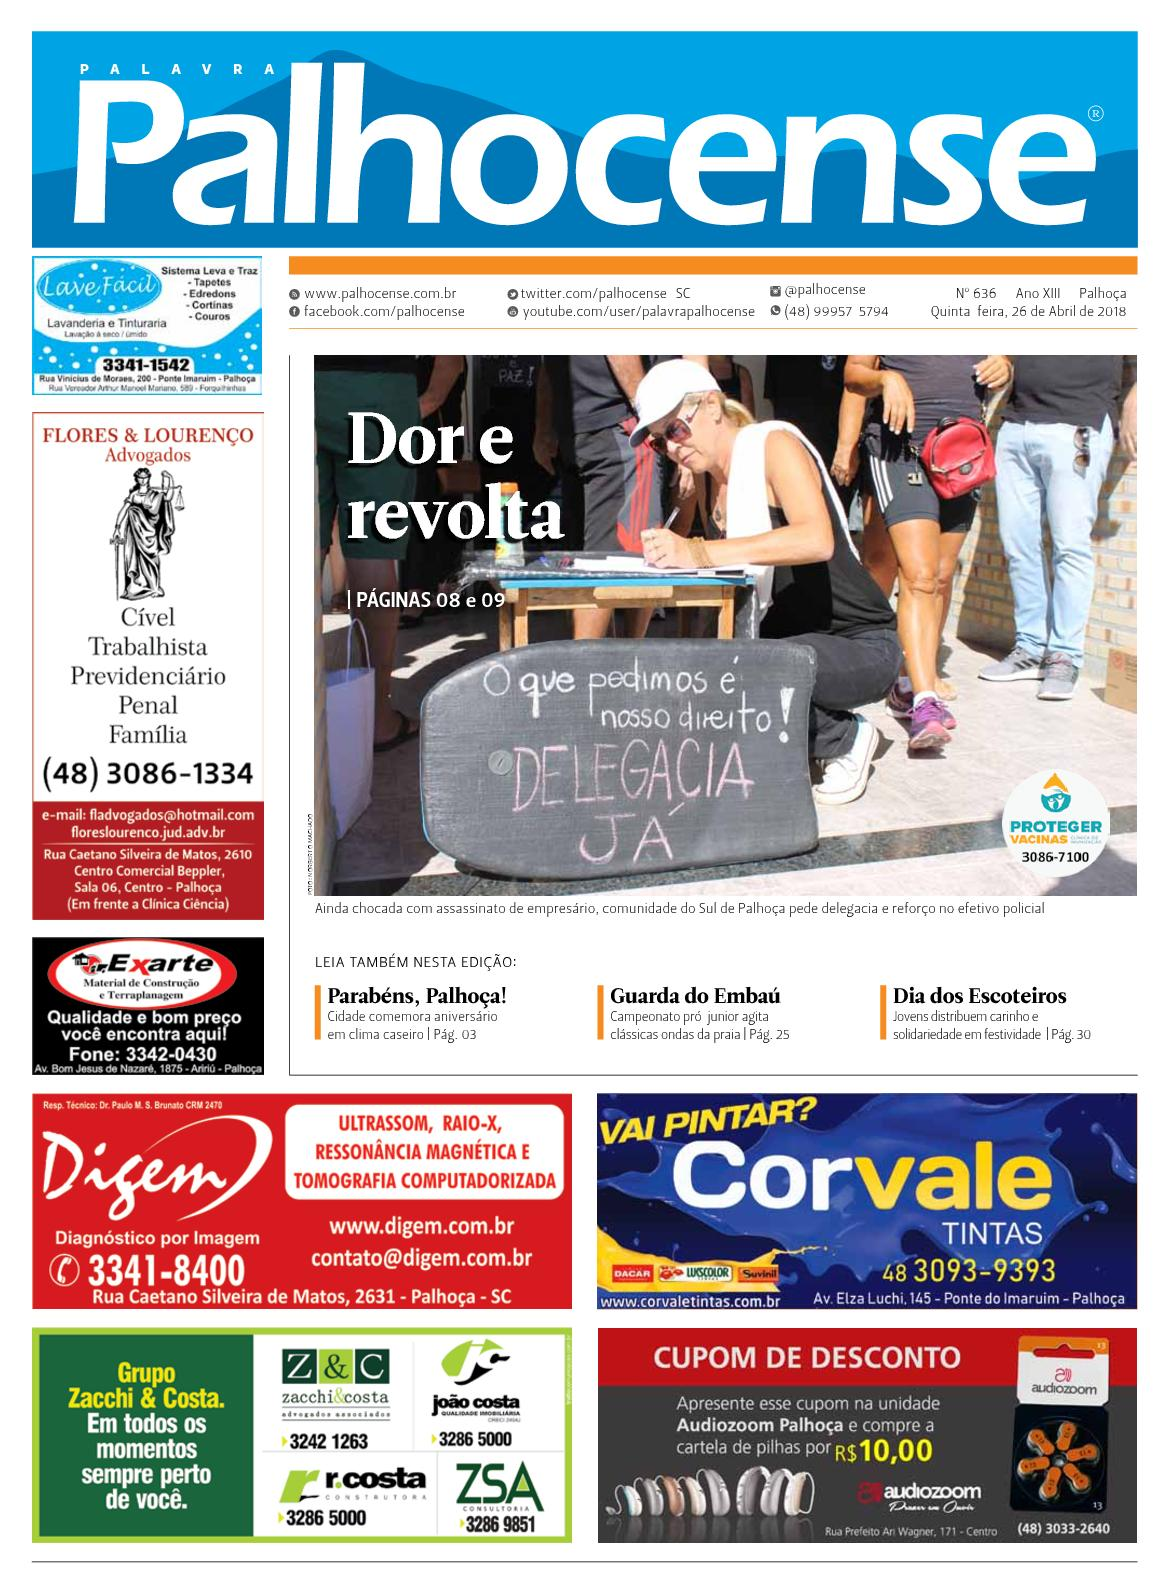 54fb3a7929 Calaméo - JORNAL PALAVRA PALHOCENSE - EDIÇÃO 636